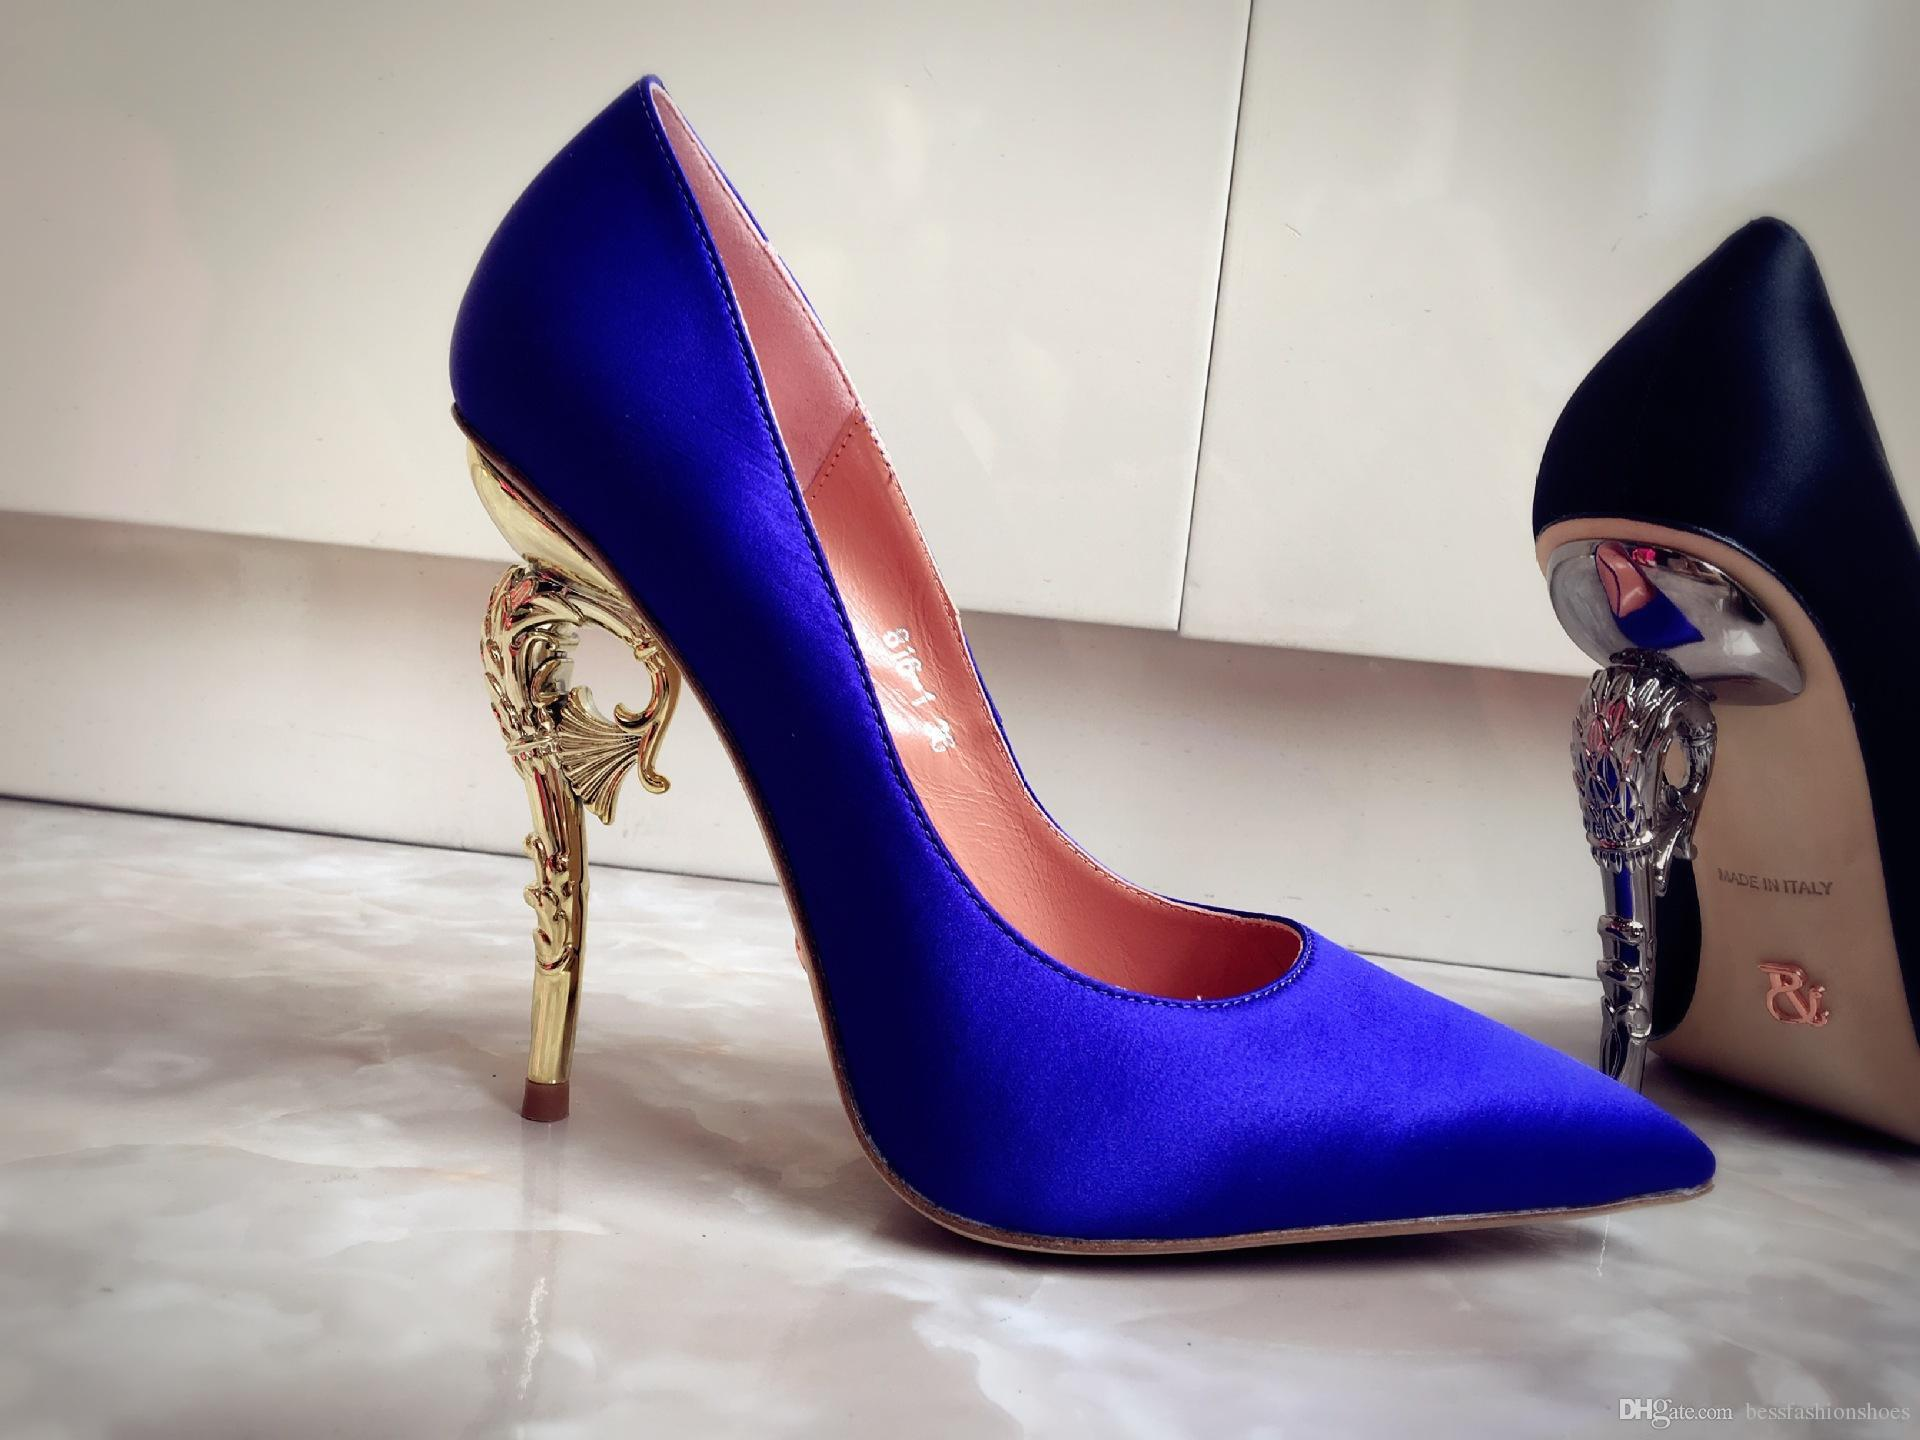 Ralph Russo Haute Couture Kollektion SCHUHE blue satin BAROCKEN PUMPEN SMARAGD SATIN MIT GELB GOLD HEEL Brautschuhe für moderne Bräute